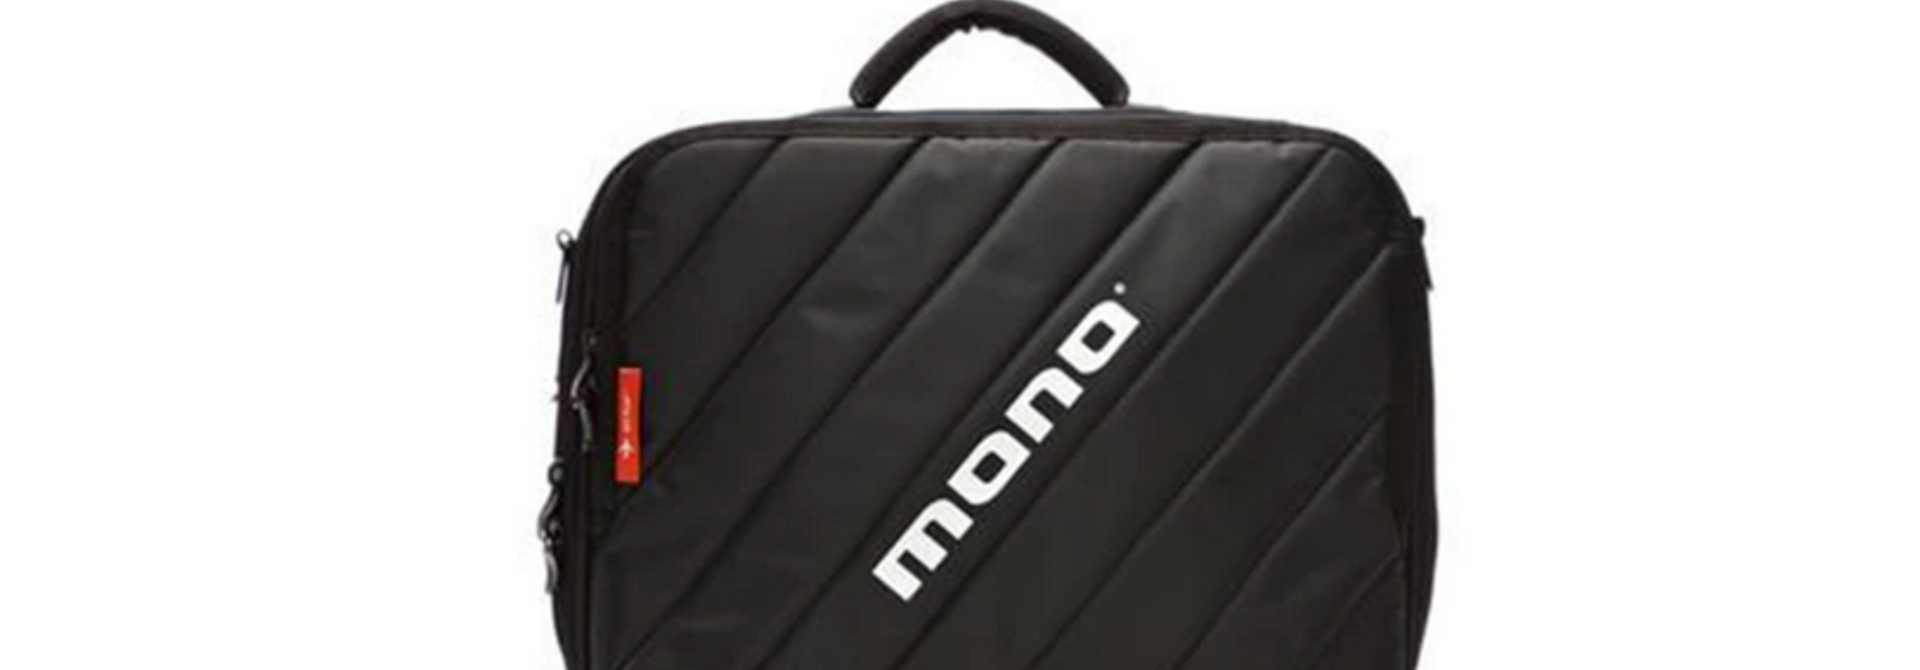 Mono Classic Club Pedalboard Case  18x12 M80-CLUB-V2-BLK